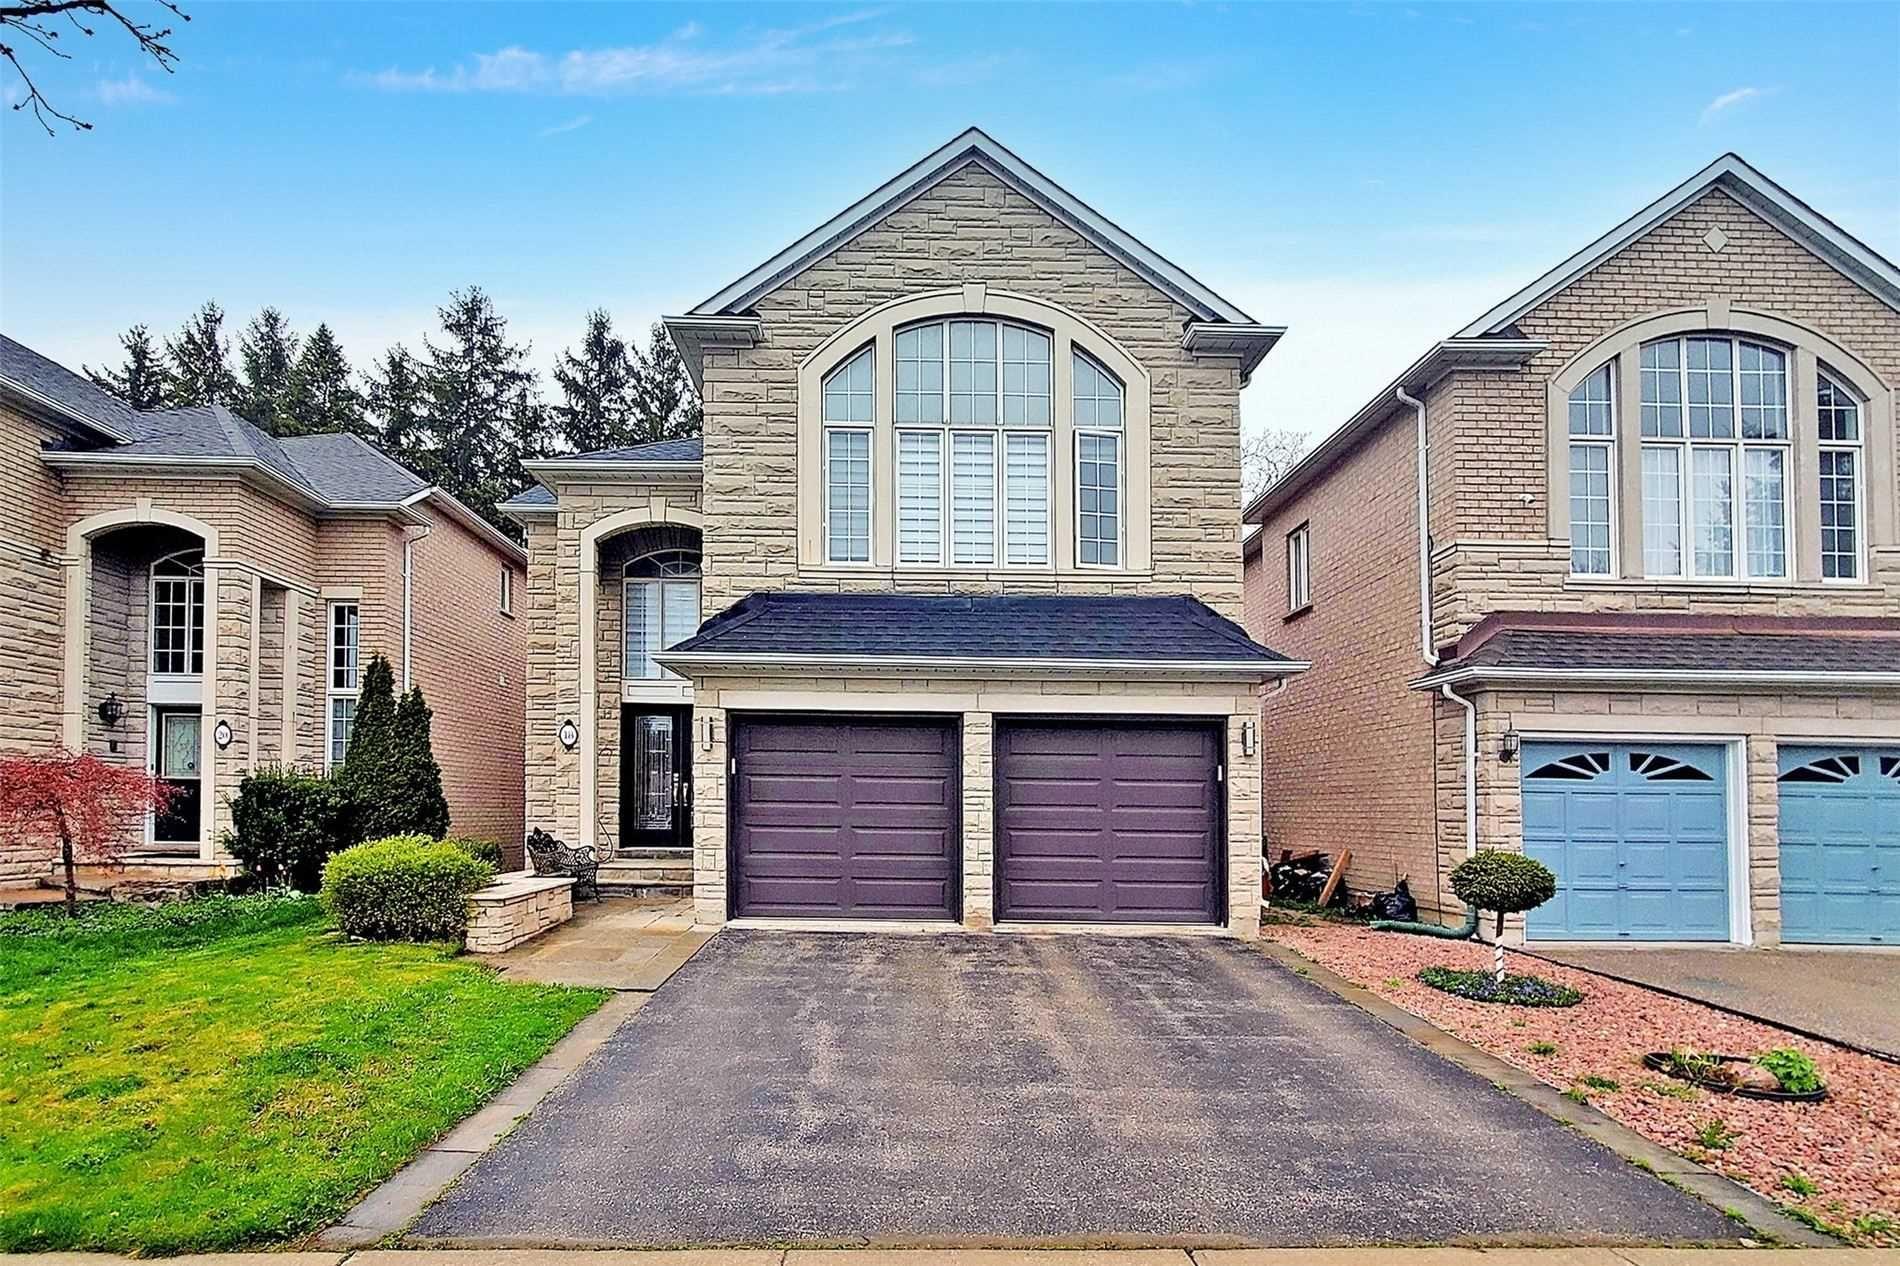 Main Photo: 18 Vitlor Drive in Richmond Hill: Oak Ridges House (2-Storey) for sale : MLS®# N5223972